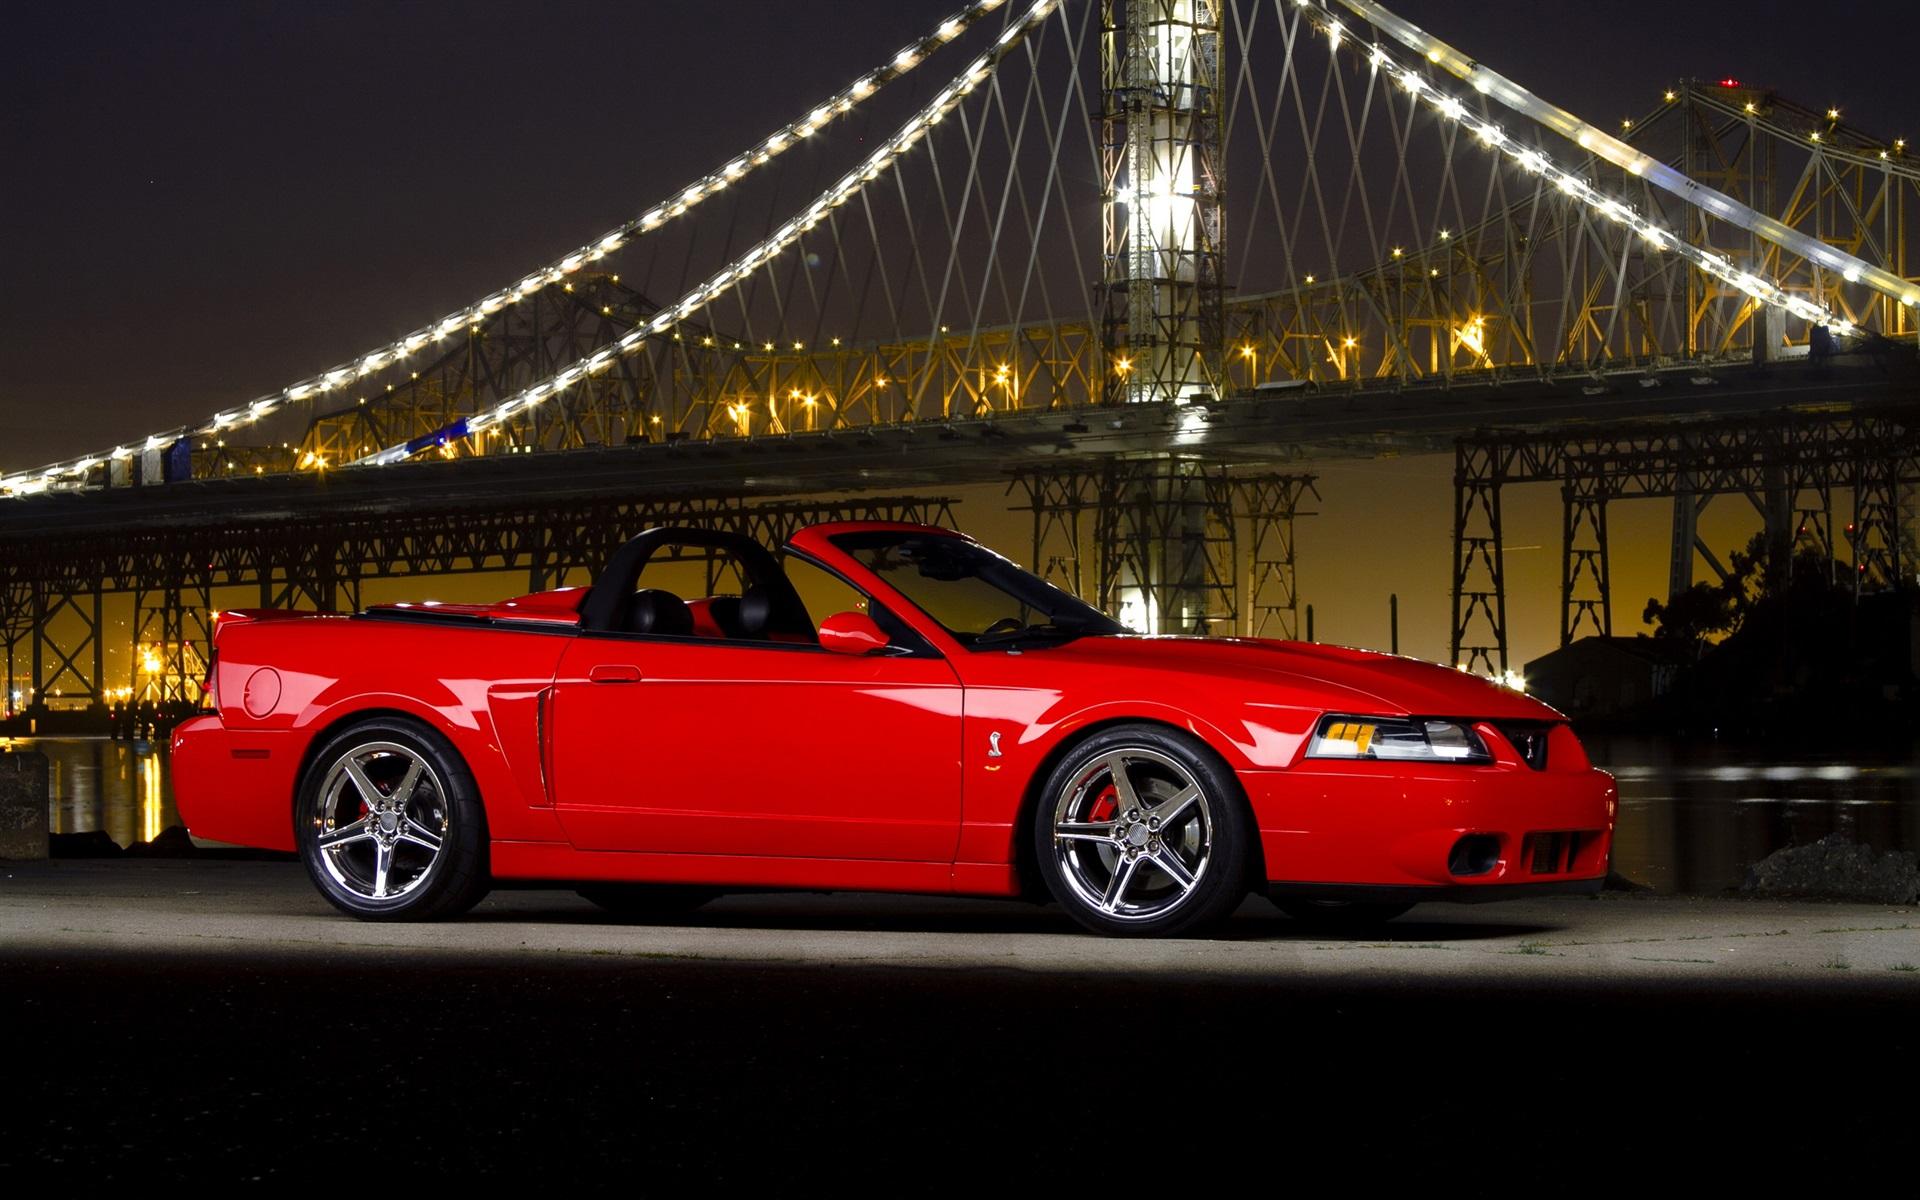 Mercedes Amg Suv >> Fondos de pantalla Ford Mustang Cobra supercar, noche ...